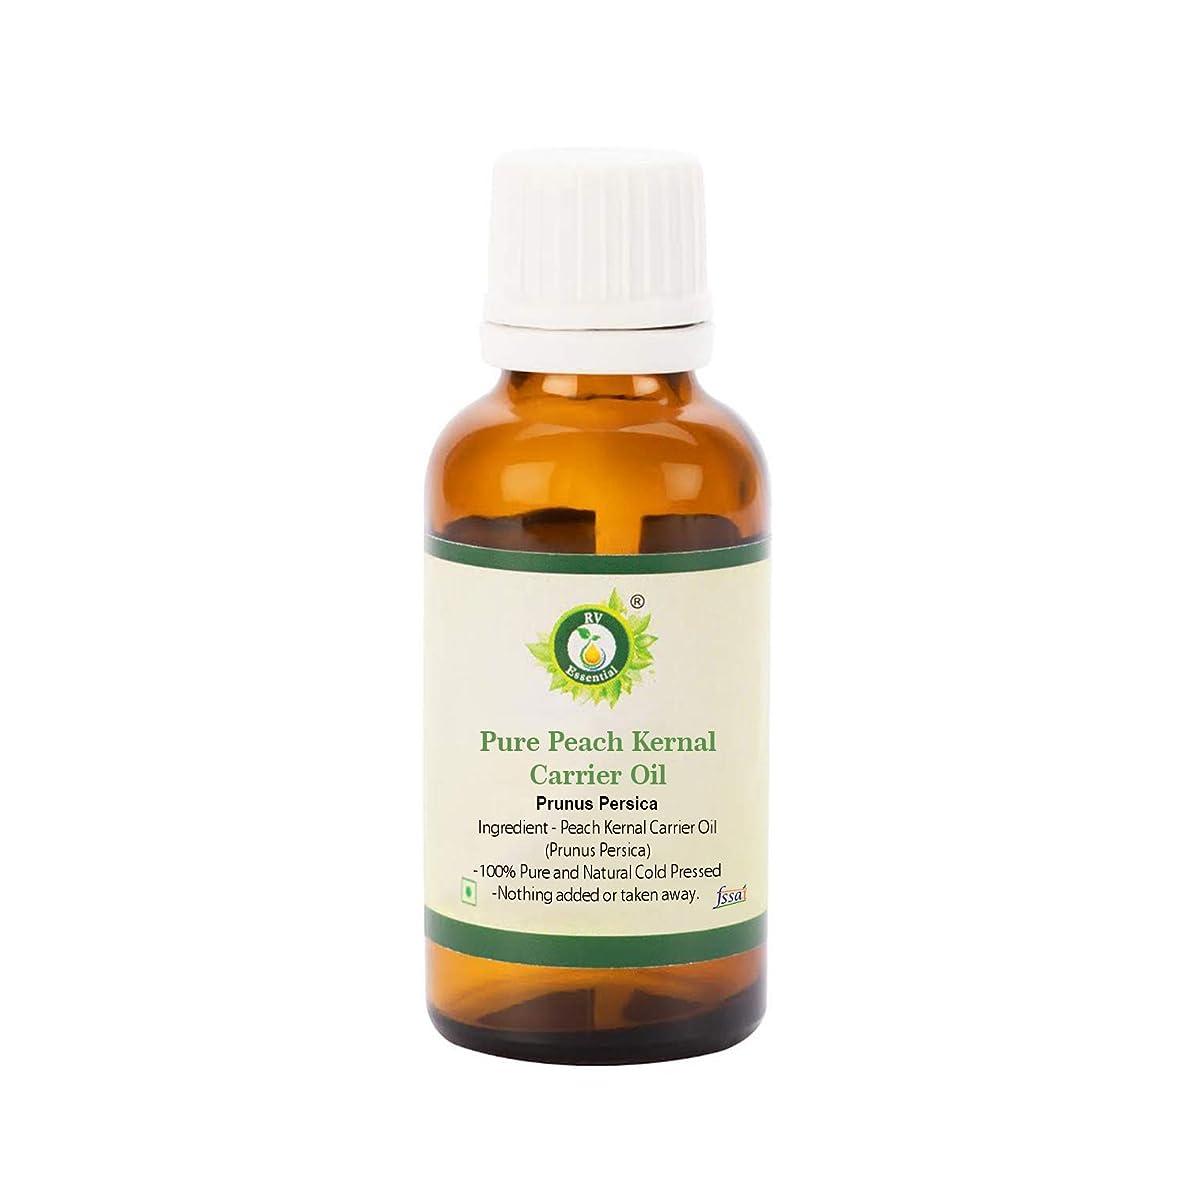 R V Essential ピュアピーチ Kernalキャリアオイル30ml (1.01oz)- Prunus Persica (100%ピュア&ナチュラルコールドPressed) Pure Peach Kernal Carrier Oil